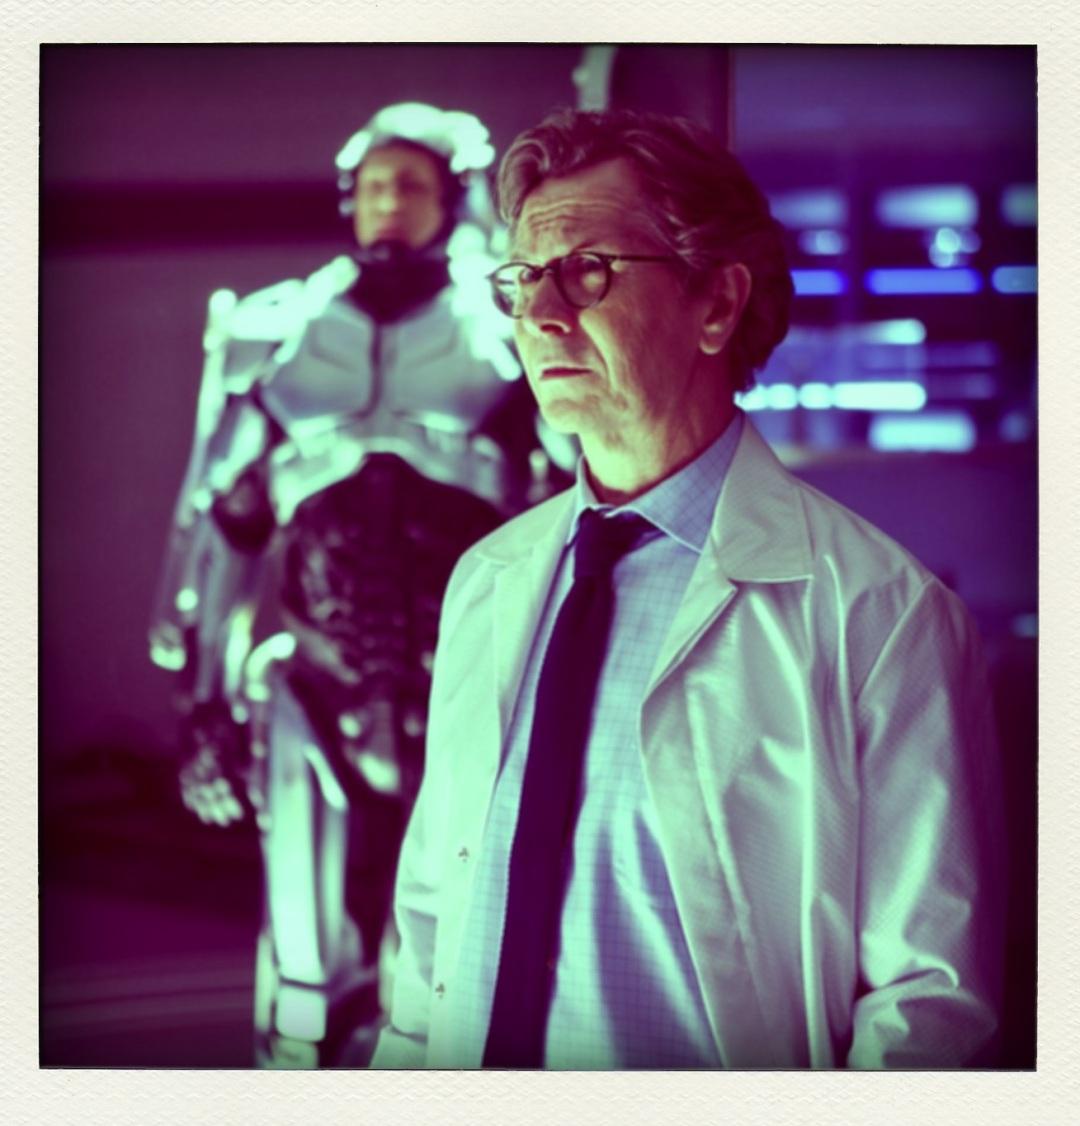 RoboCop 2014 @ www.cinemascream.co.uk